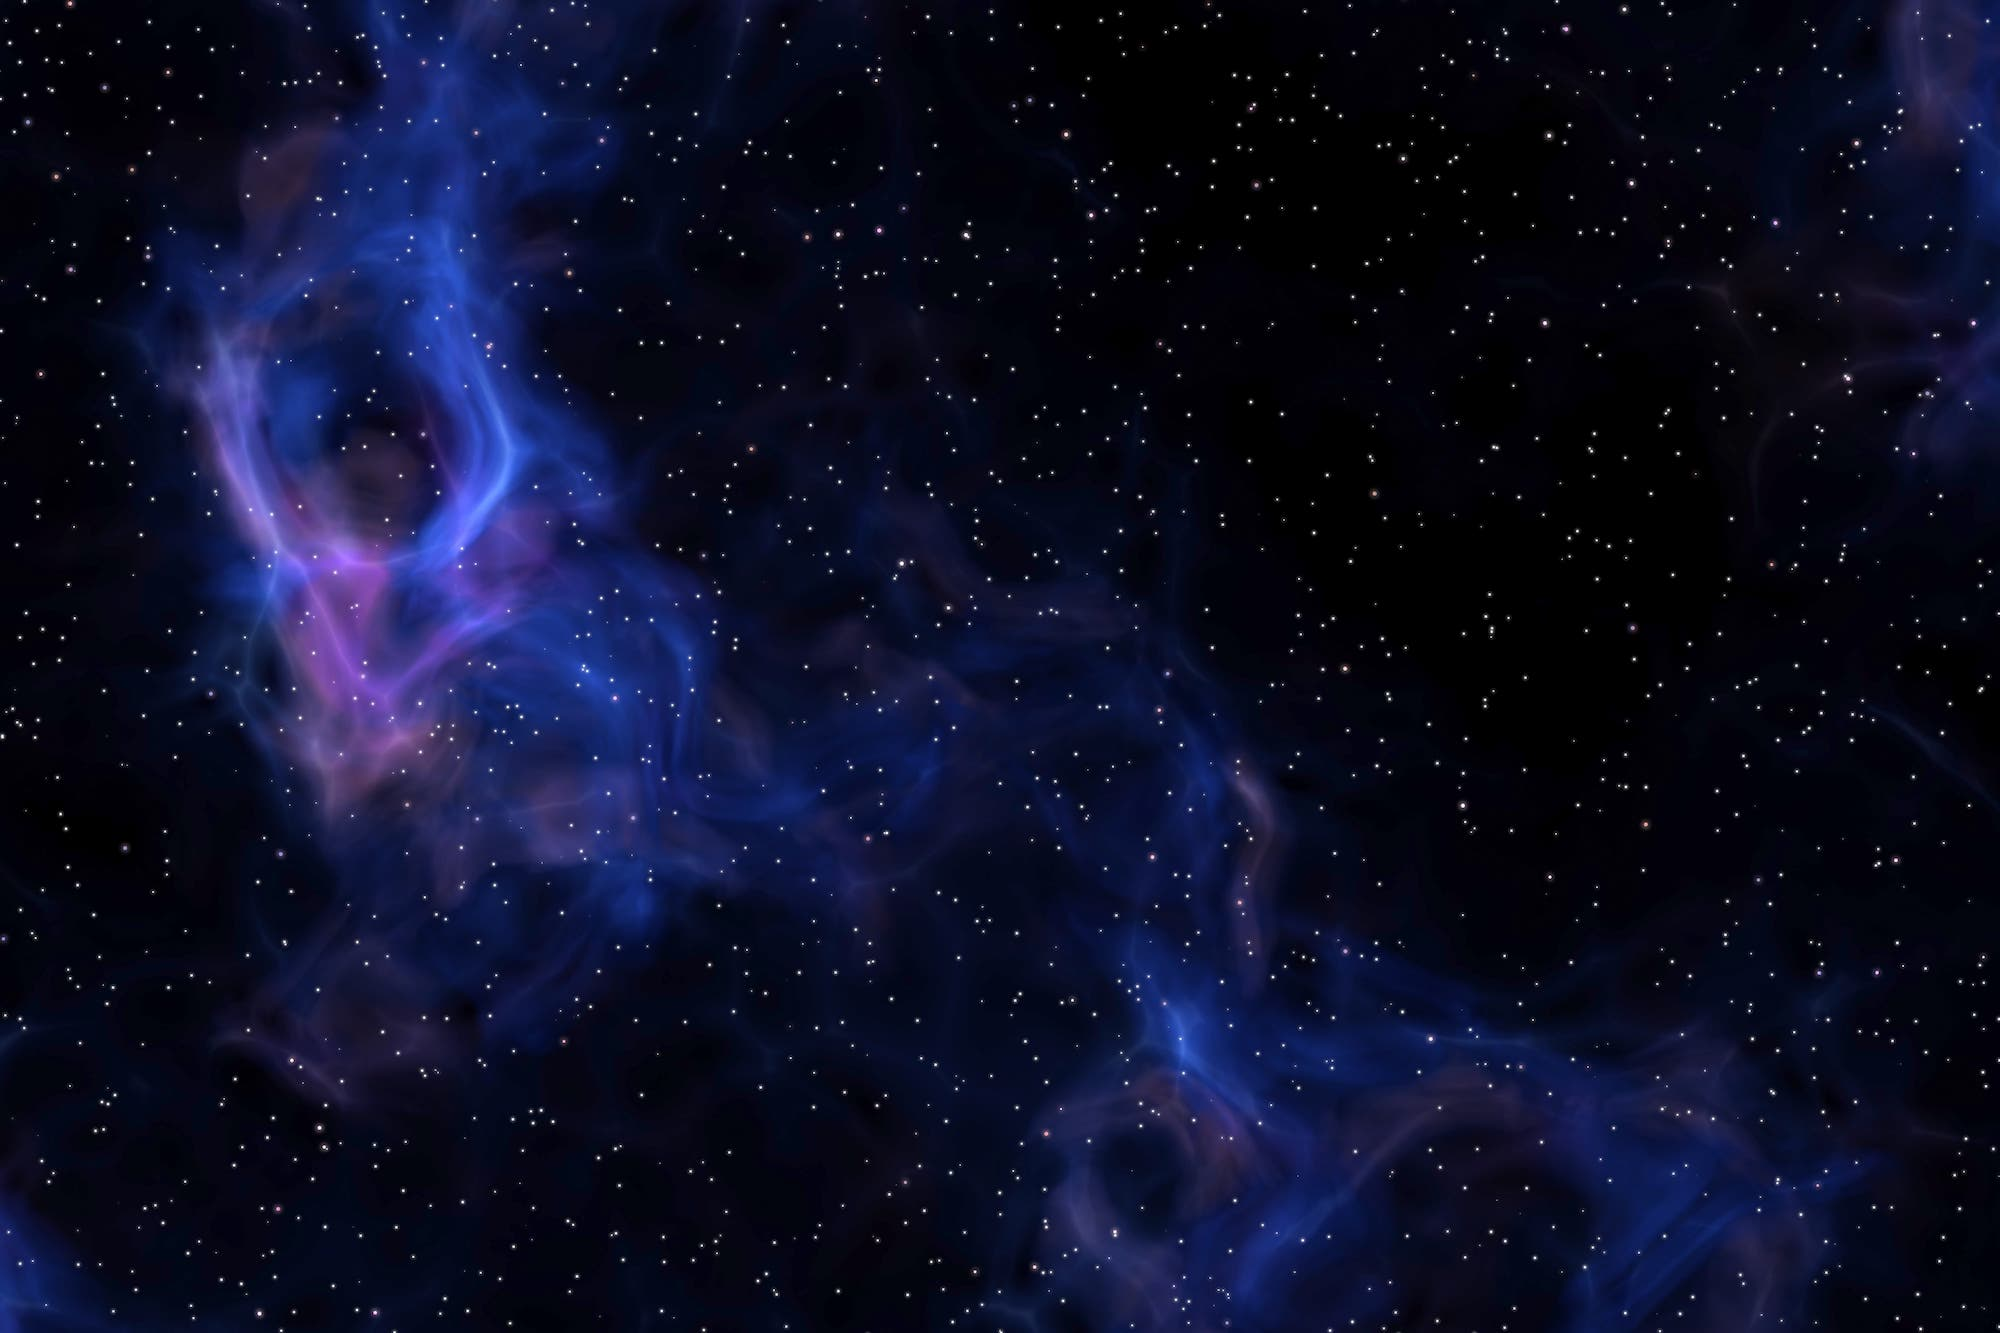 stars-in-the-deep-space-PBDM5QC-min.jpg